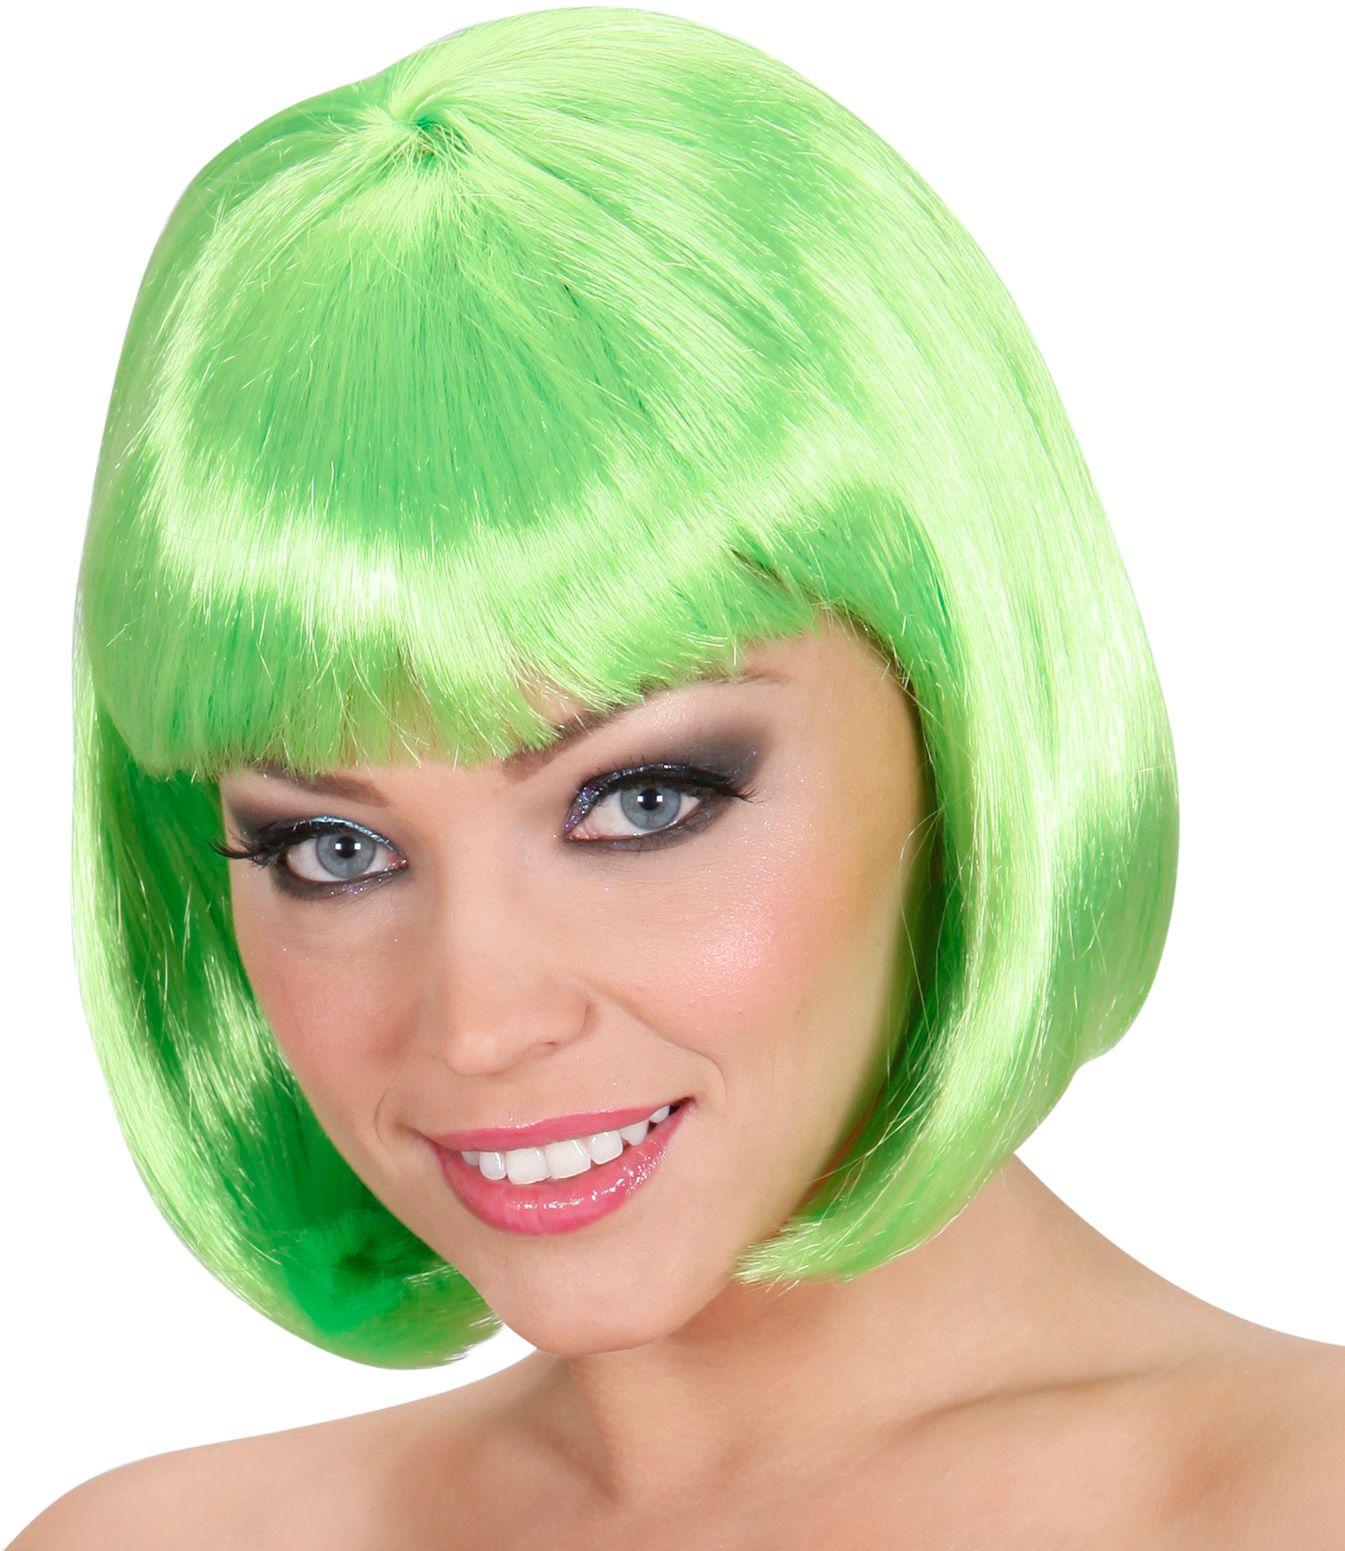 Groene pruik kort haar